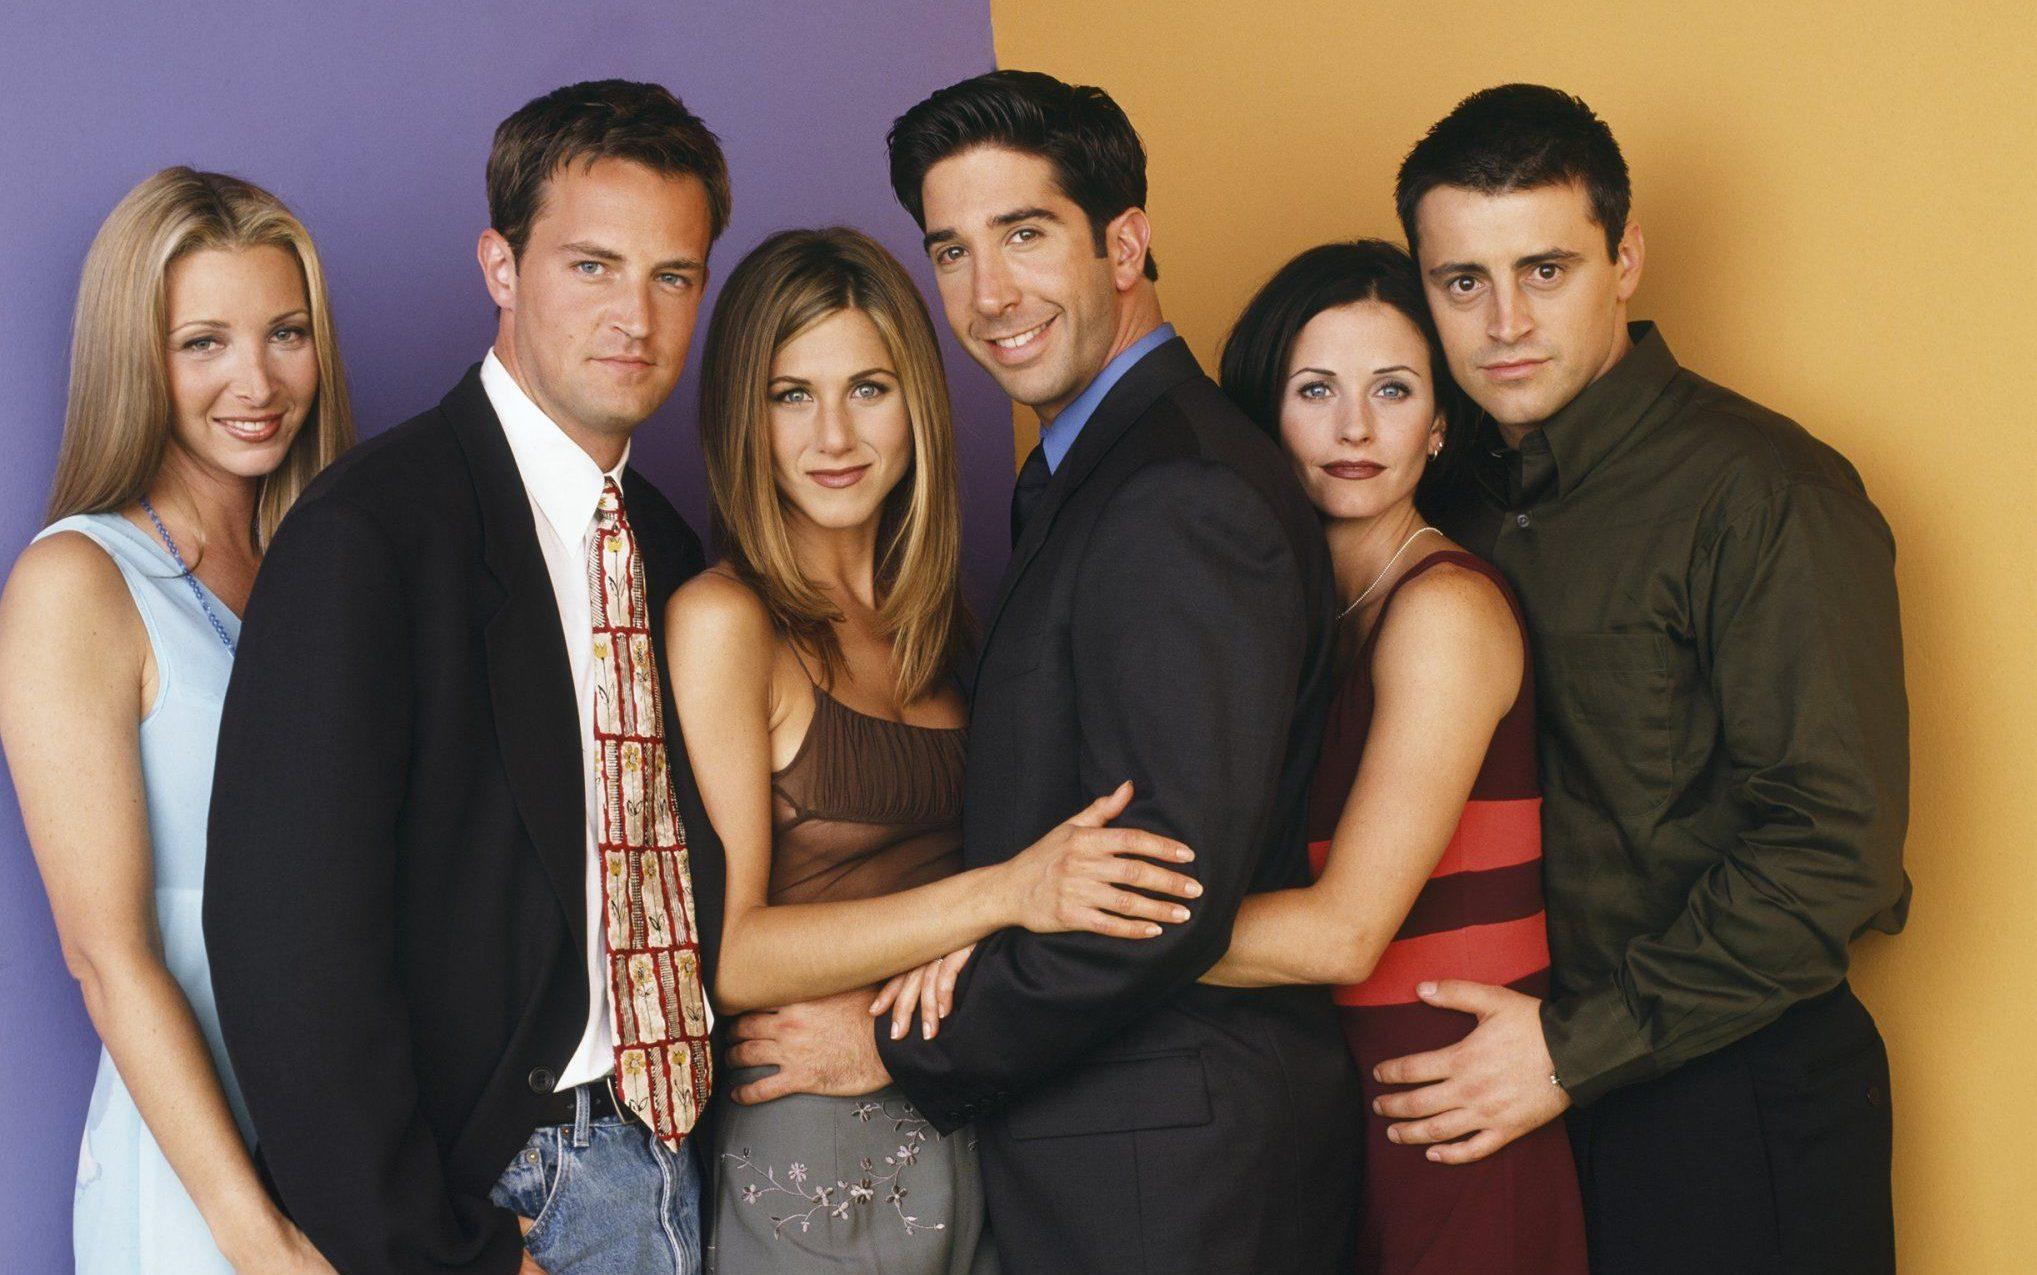 Matt LeBlanc shatters hopes of Friends reunion: 'Definitely say never'